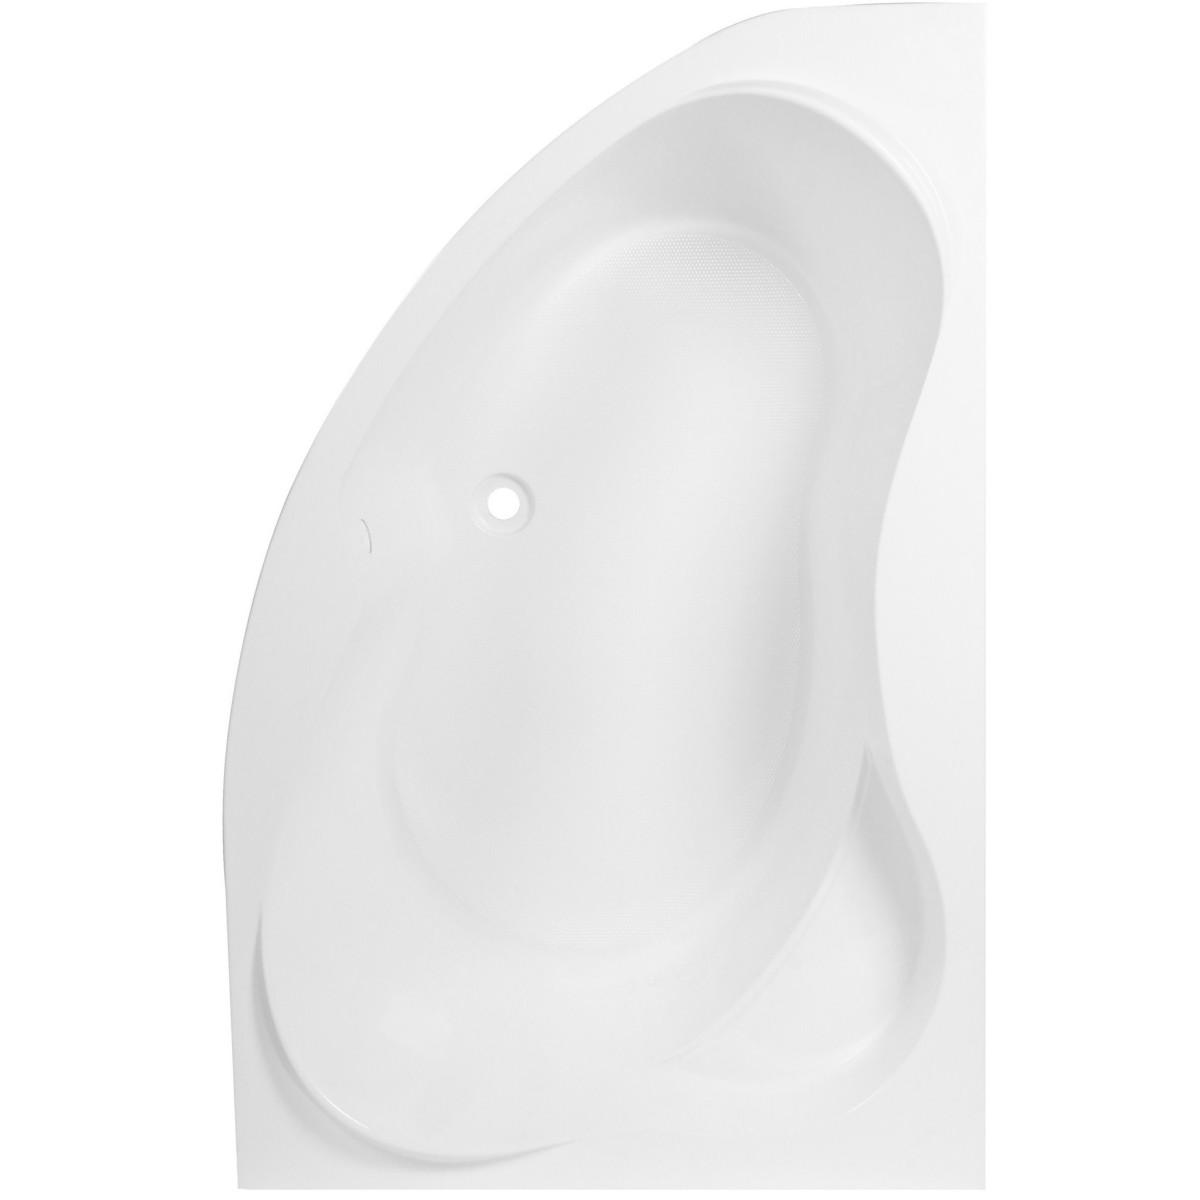 Ванна правостороняя Глоу акрил 170х110 см